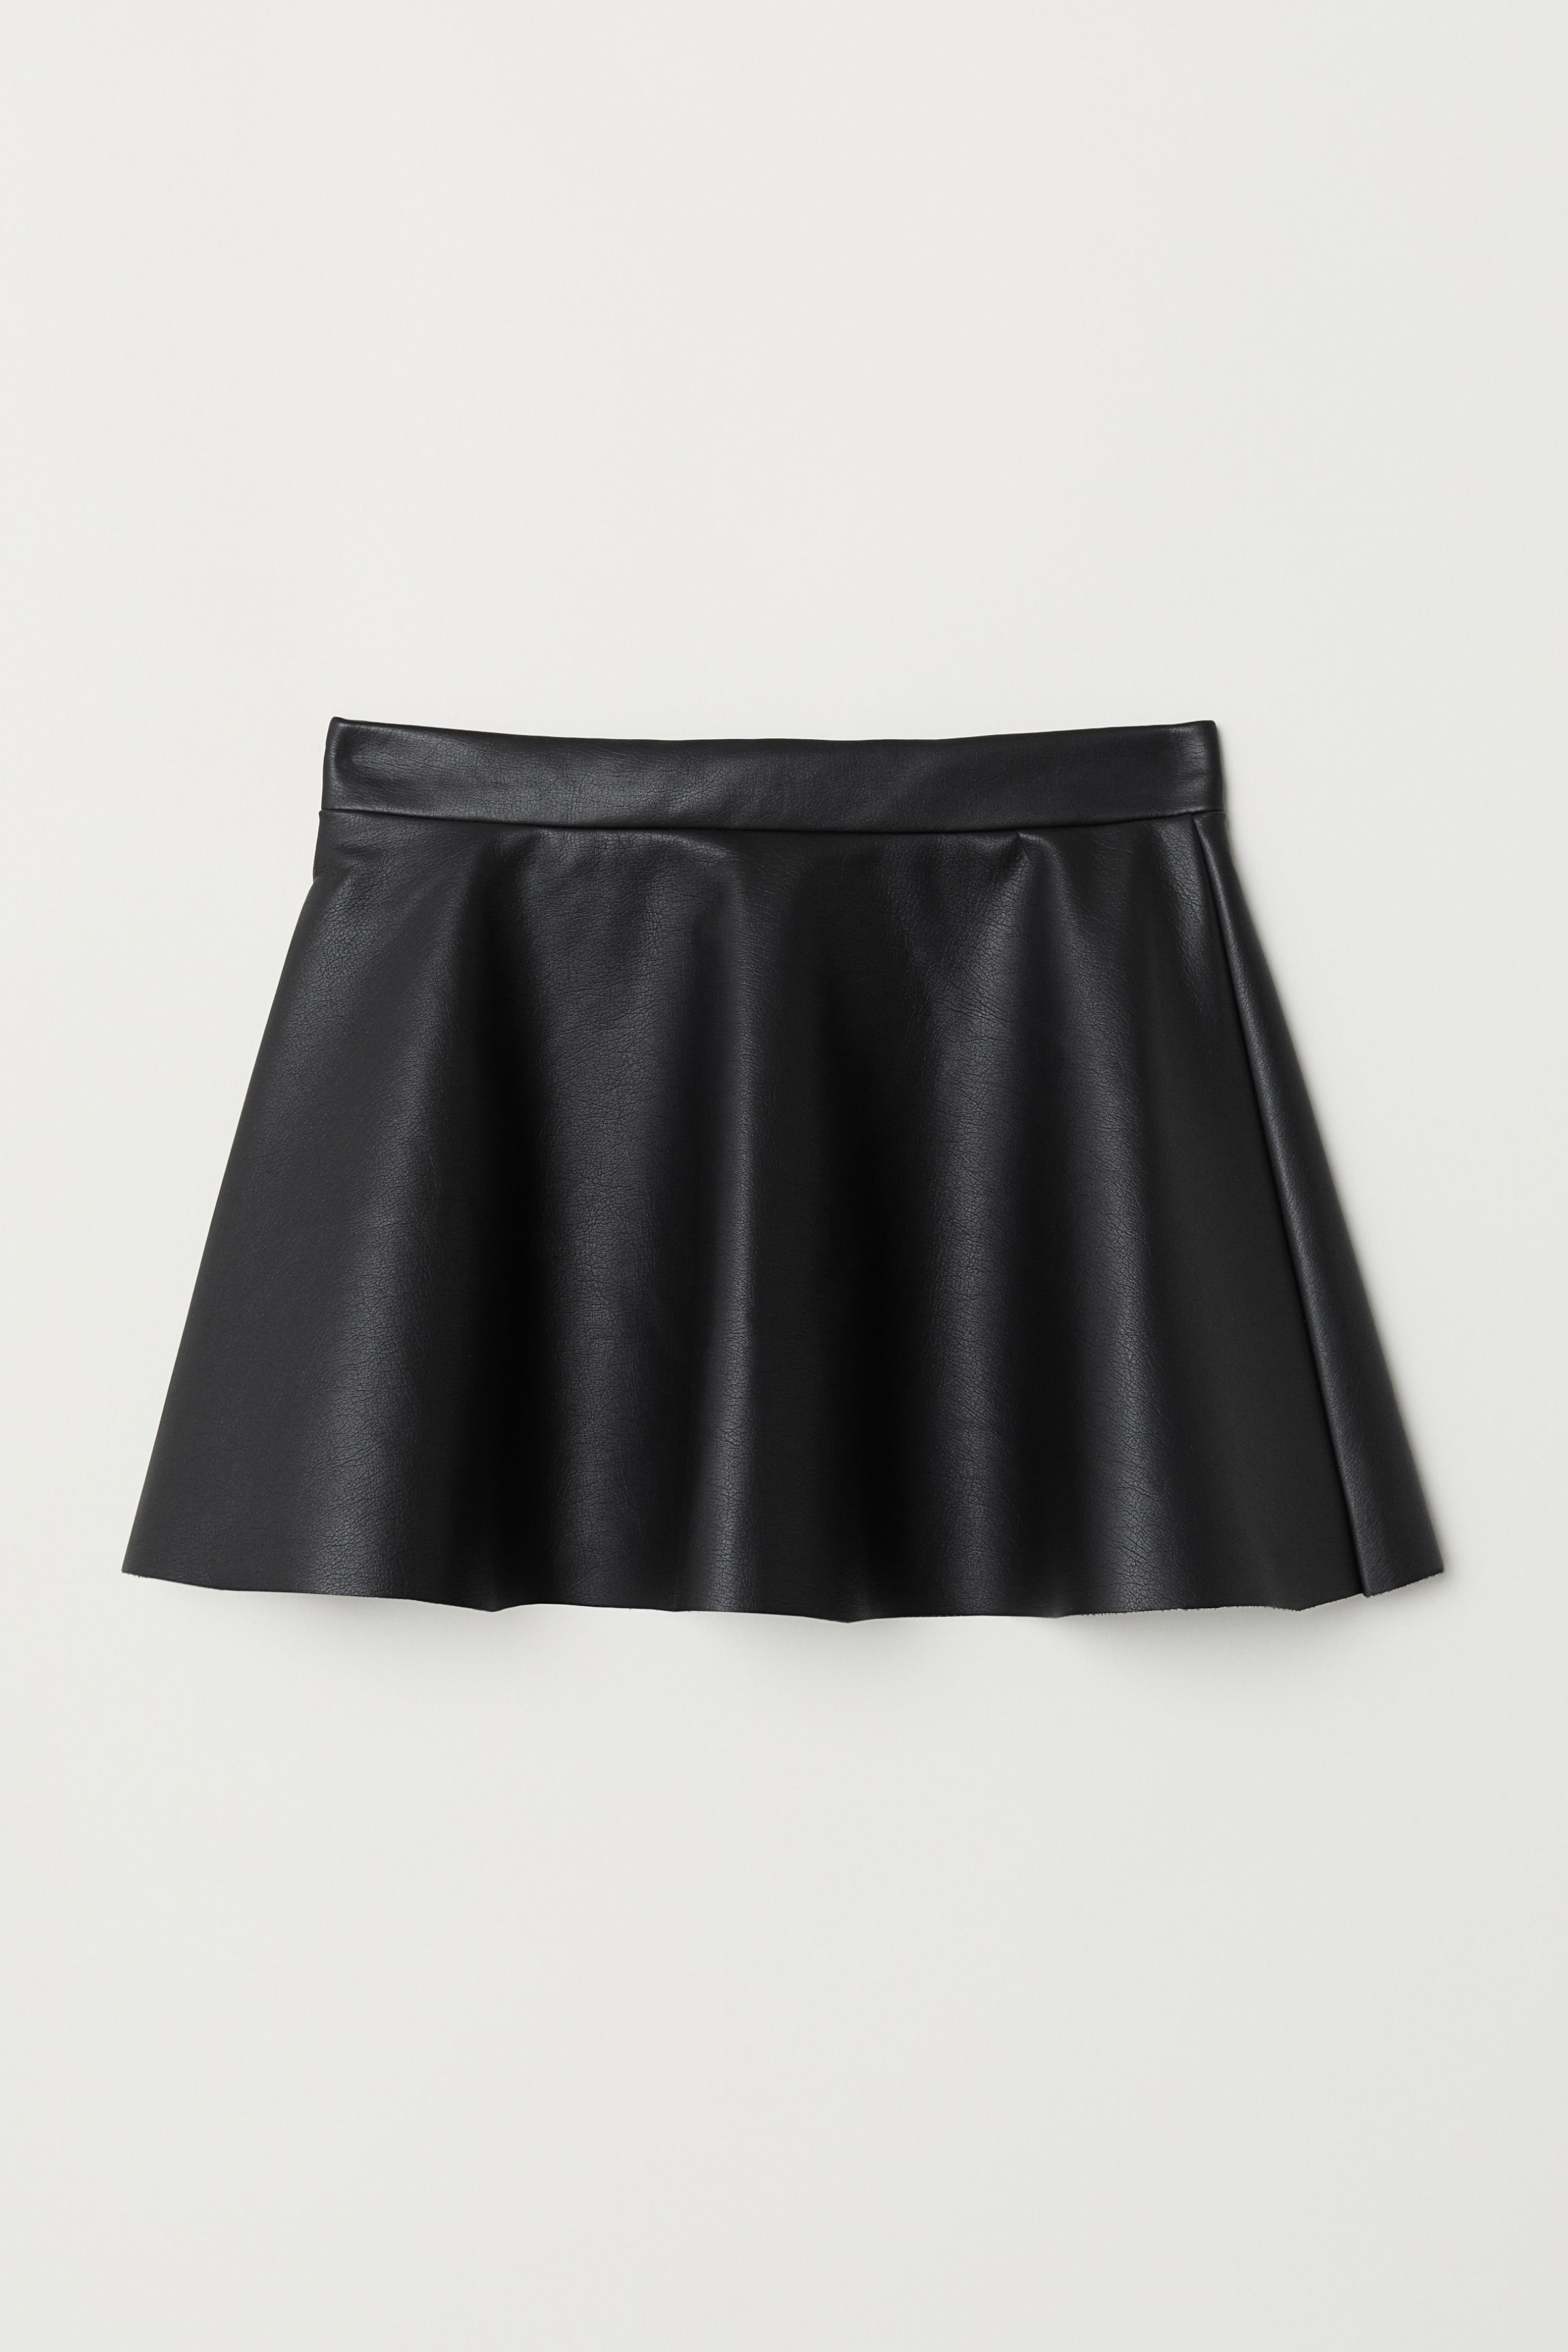 8c2e0c0f4 Faux Leather Skirt - Black - Kids | H&M US